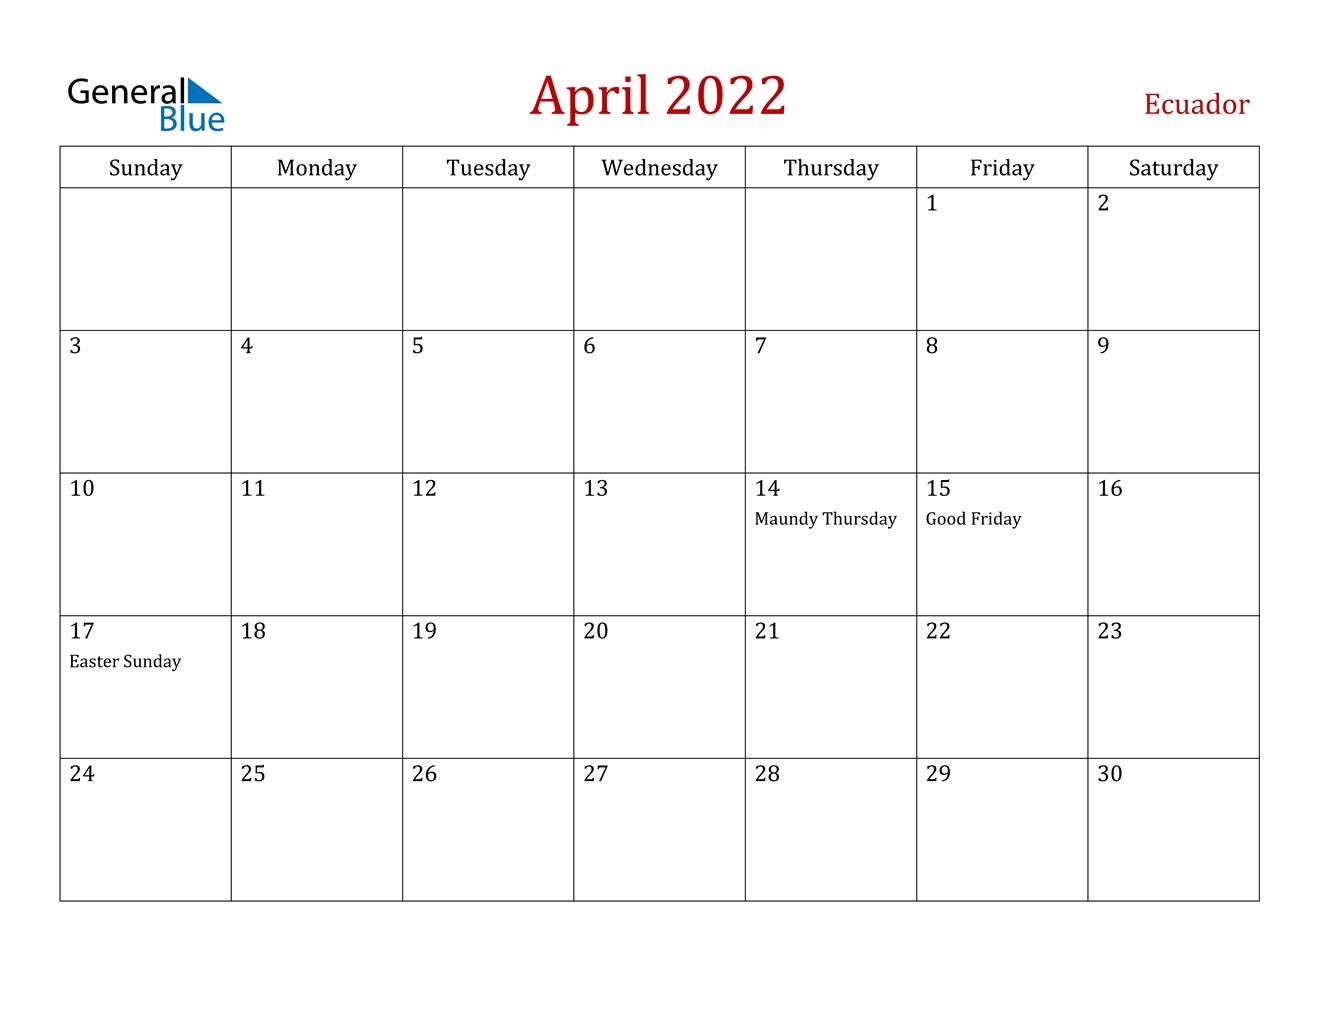 April 2022 Calendar - Ecuador